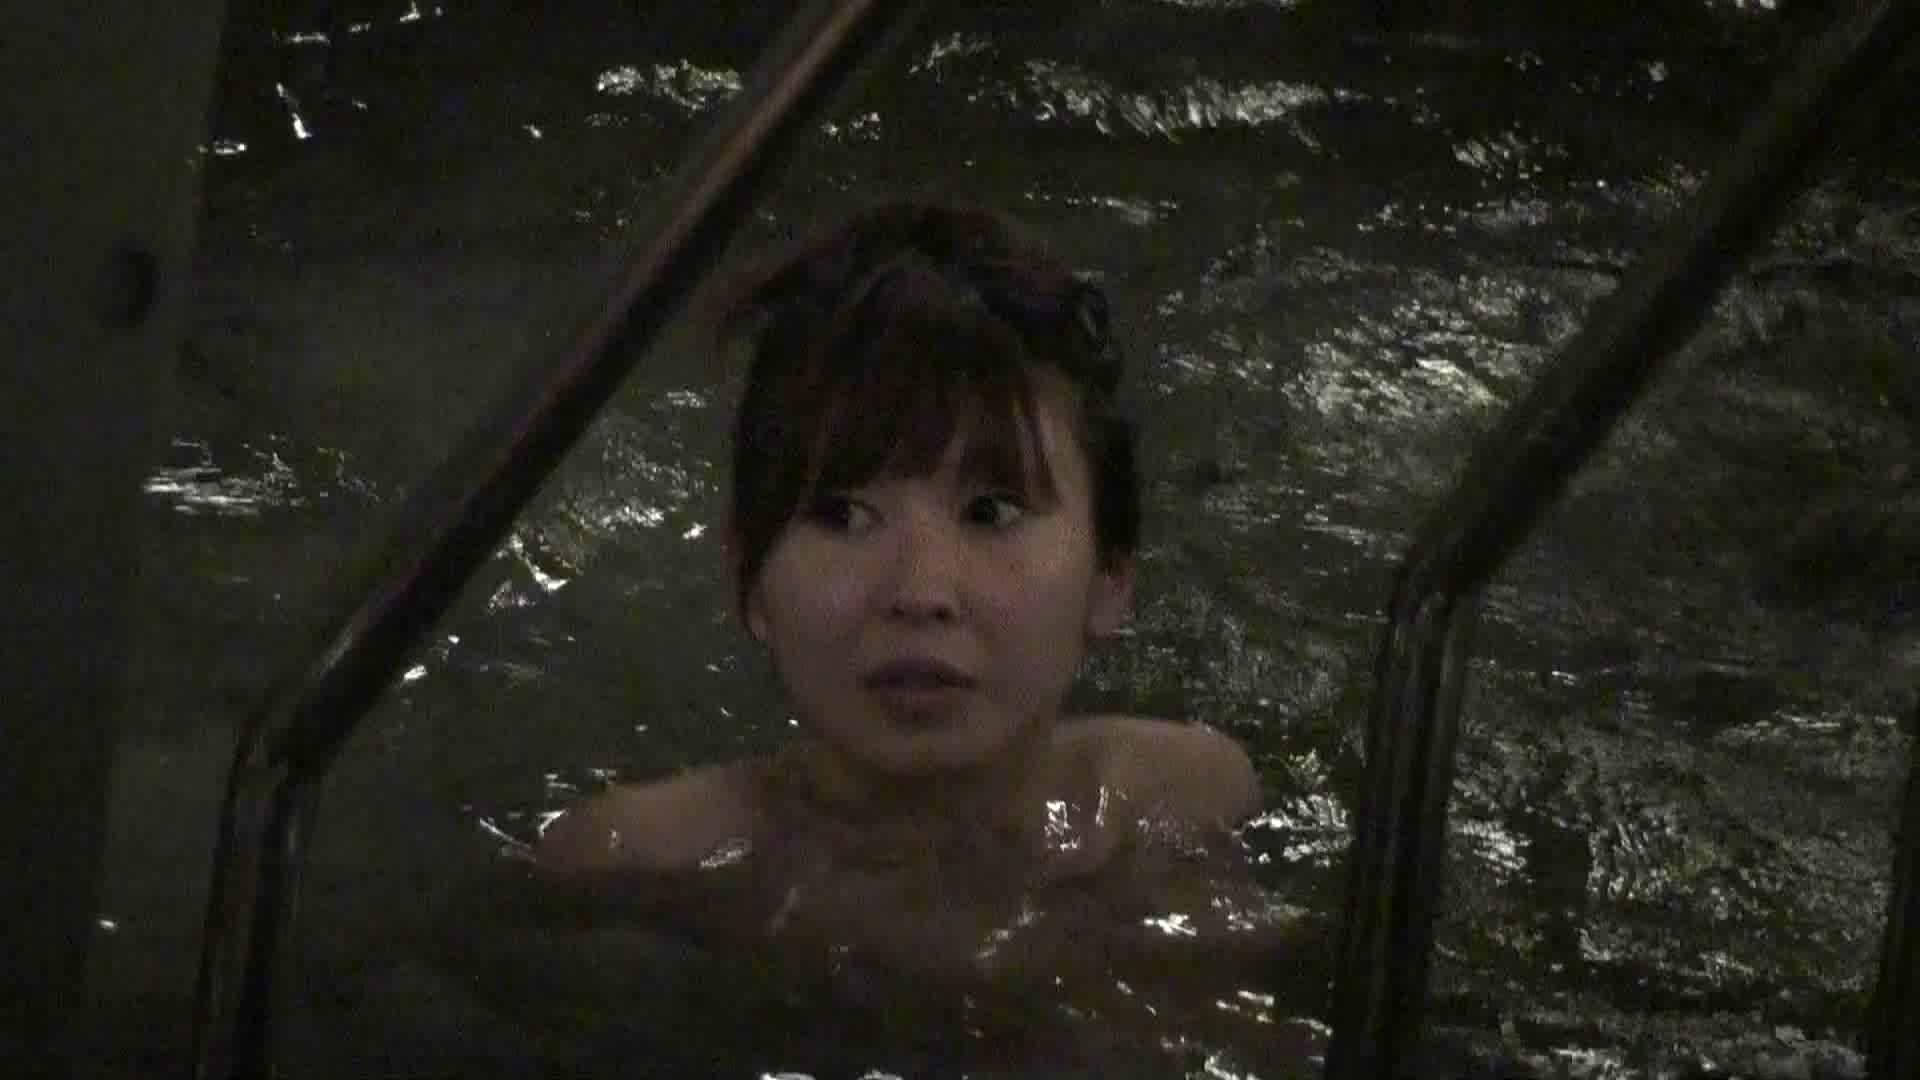 Aquaな露天風呂Vol.410 盗撮  73連発 49